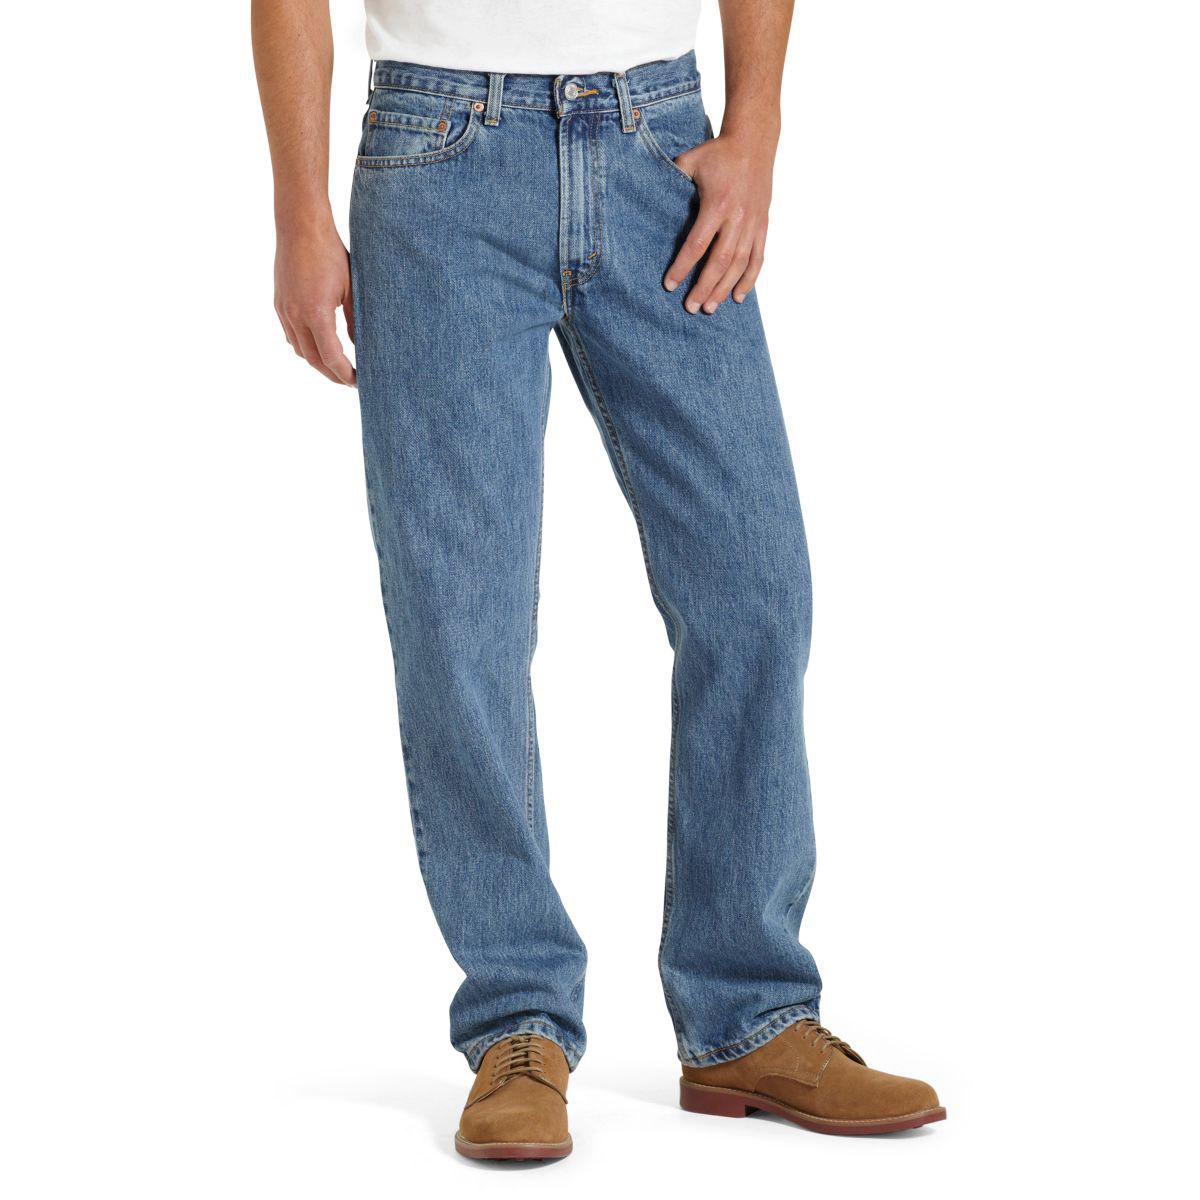 Levi's Men's 505 Regular Fit Jeans - Blue, 35/34